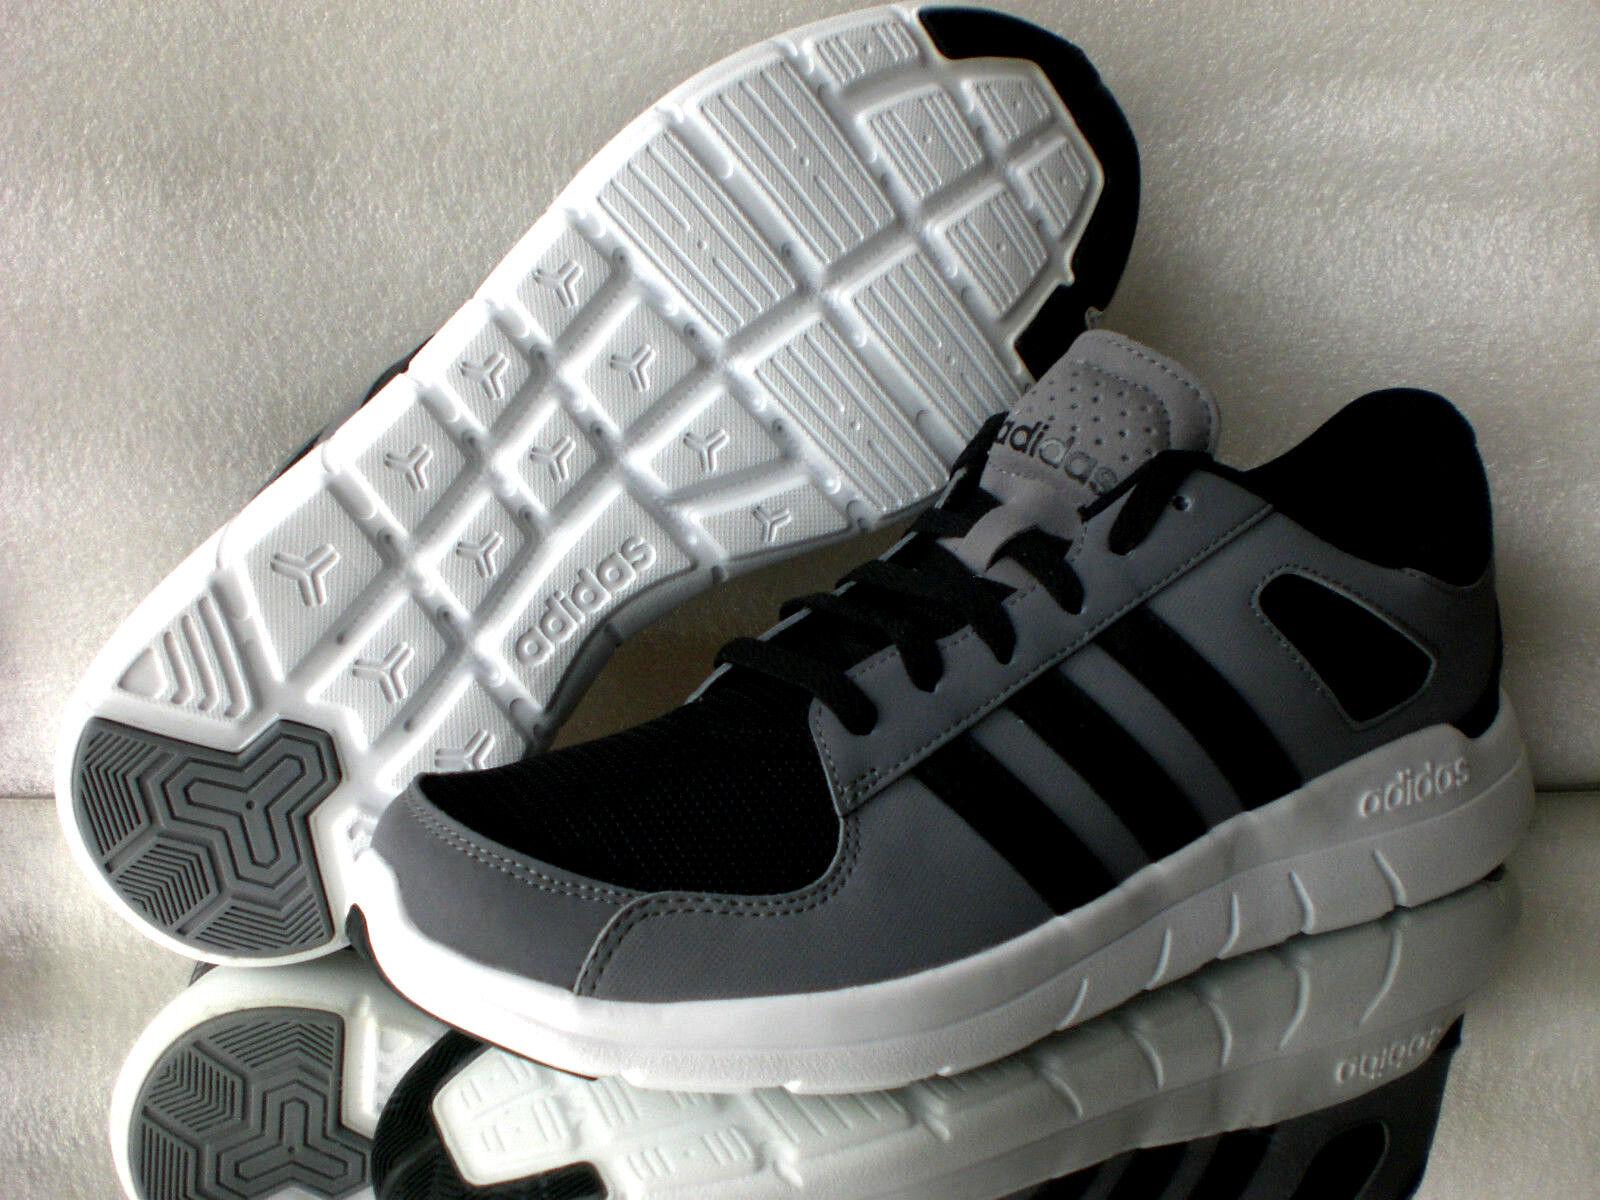 Adidas Neo X Lite F98966 Grau  Lauf/Turnschuhe Sneaker Herren   Neu